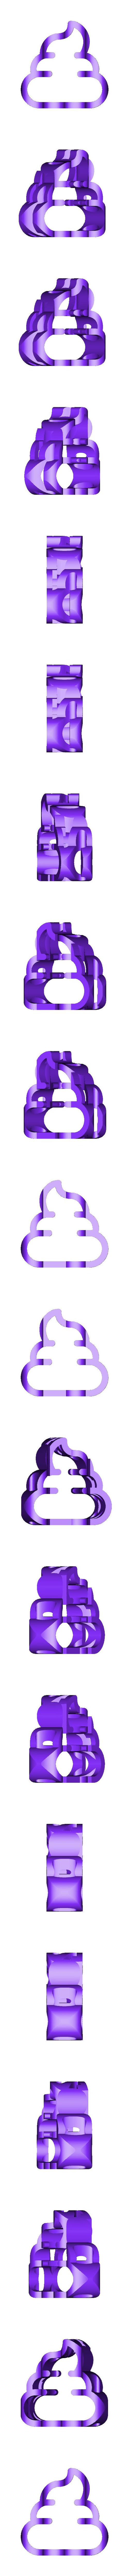 2020 poo.stl Download free STL file Text Flip - 2020 Poo • 3D printing design, MrP023